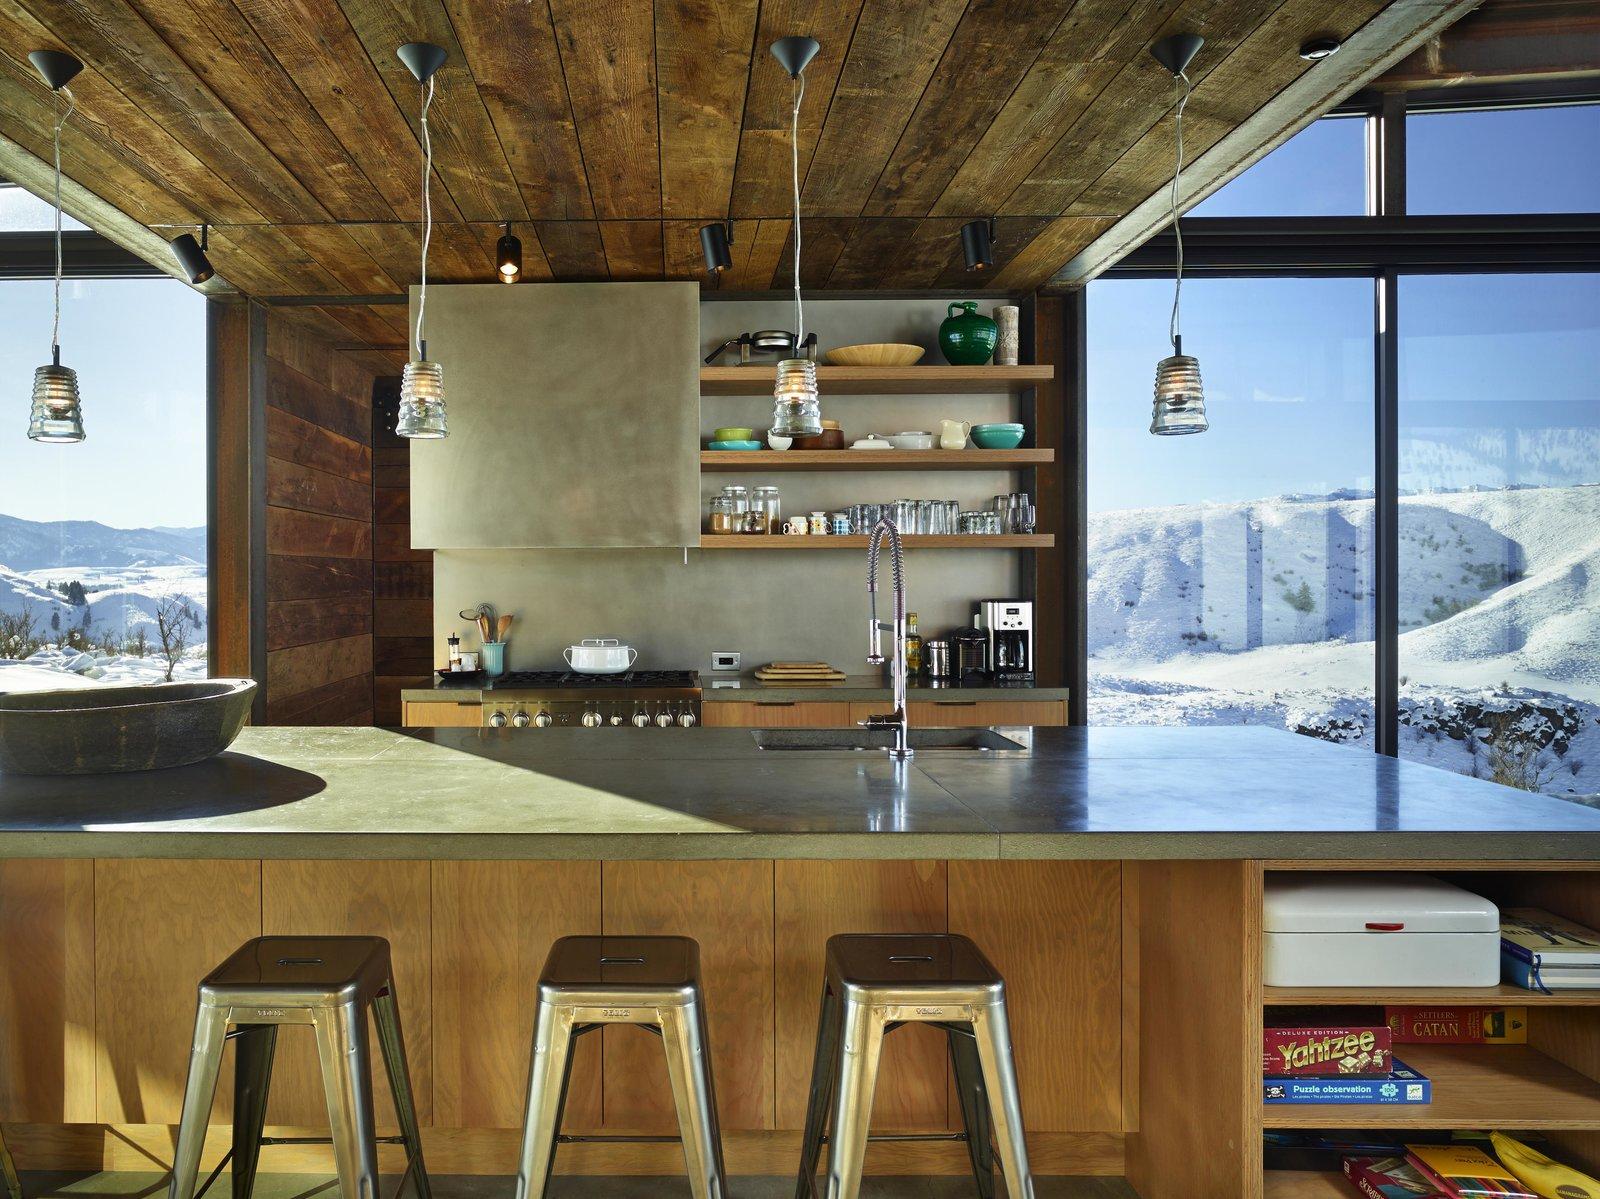 Kitchen, Concrete Counter, Concrete Backsplashe, and Pendant Lighting Studhorse | Olson Kundig  Studhorse by Olson Kundig